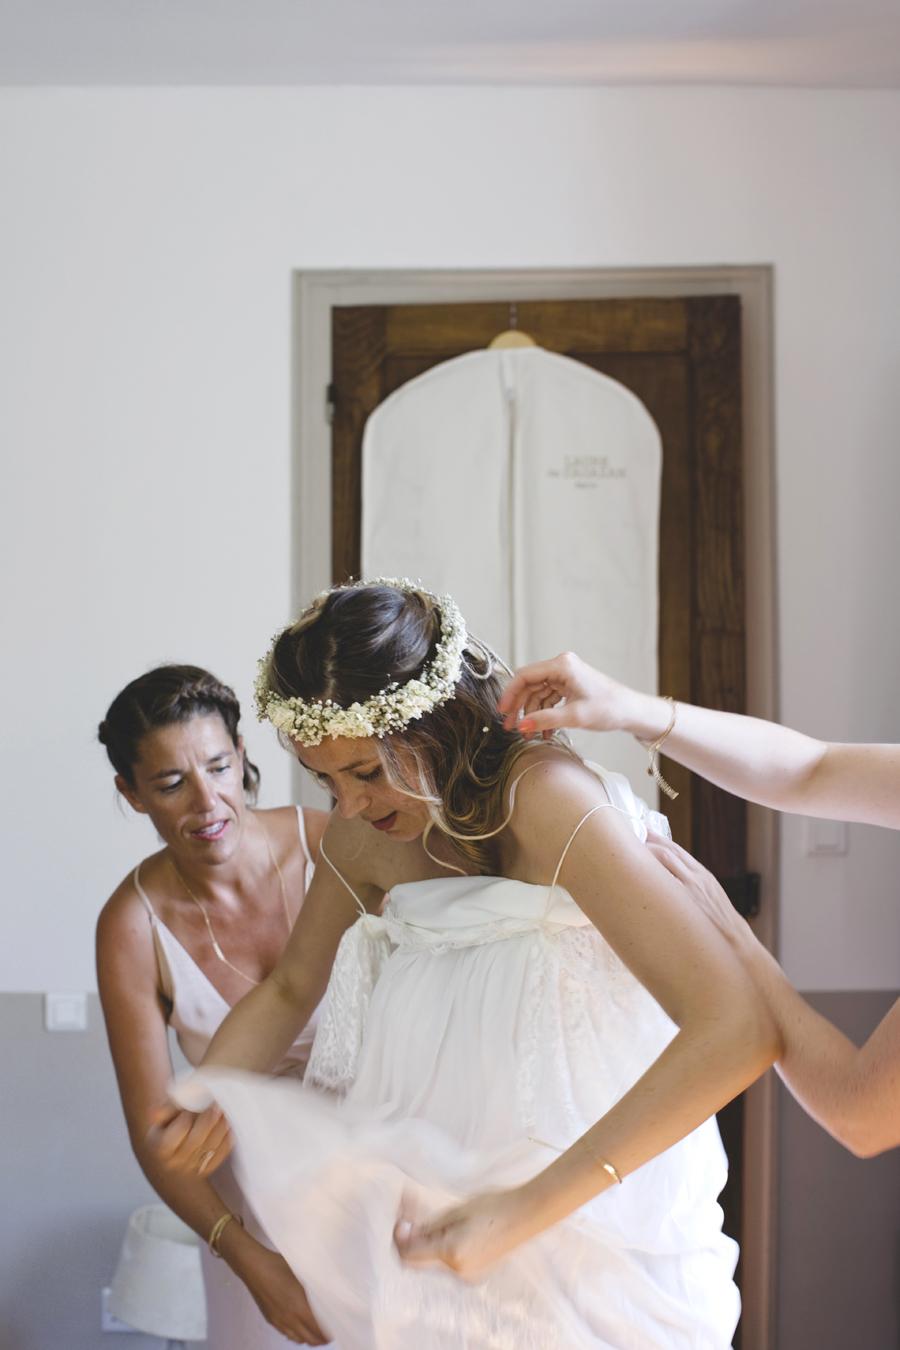 celine_marks_mariage_aurelie_keil_41